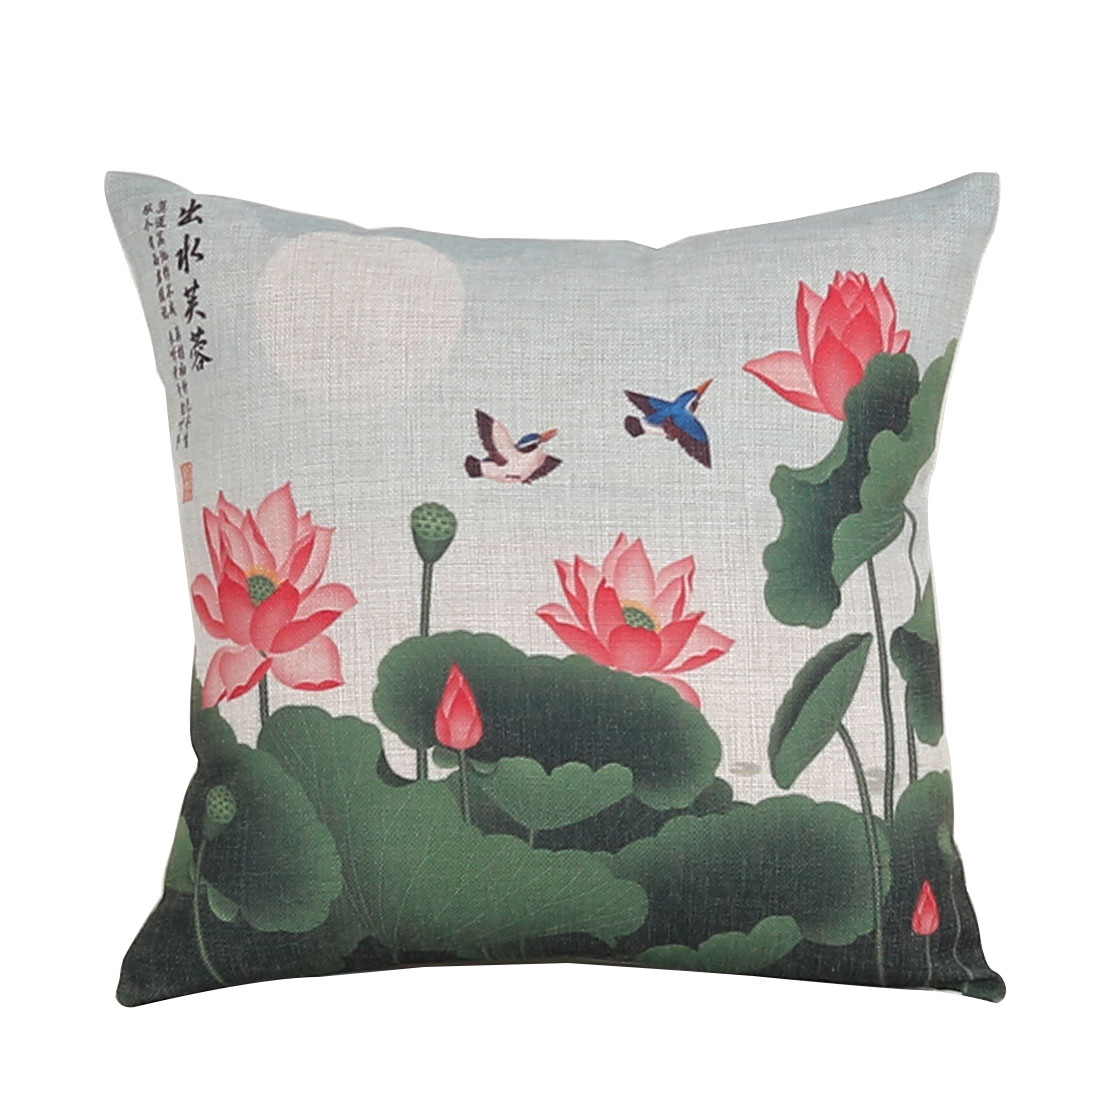 Household Sofa Cotton Linen Lotus Bird Pattern Waist Throw Cushion Cover Pillow Case